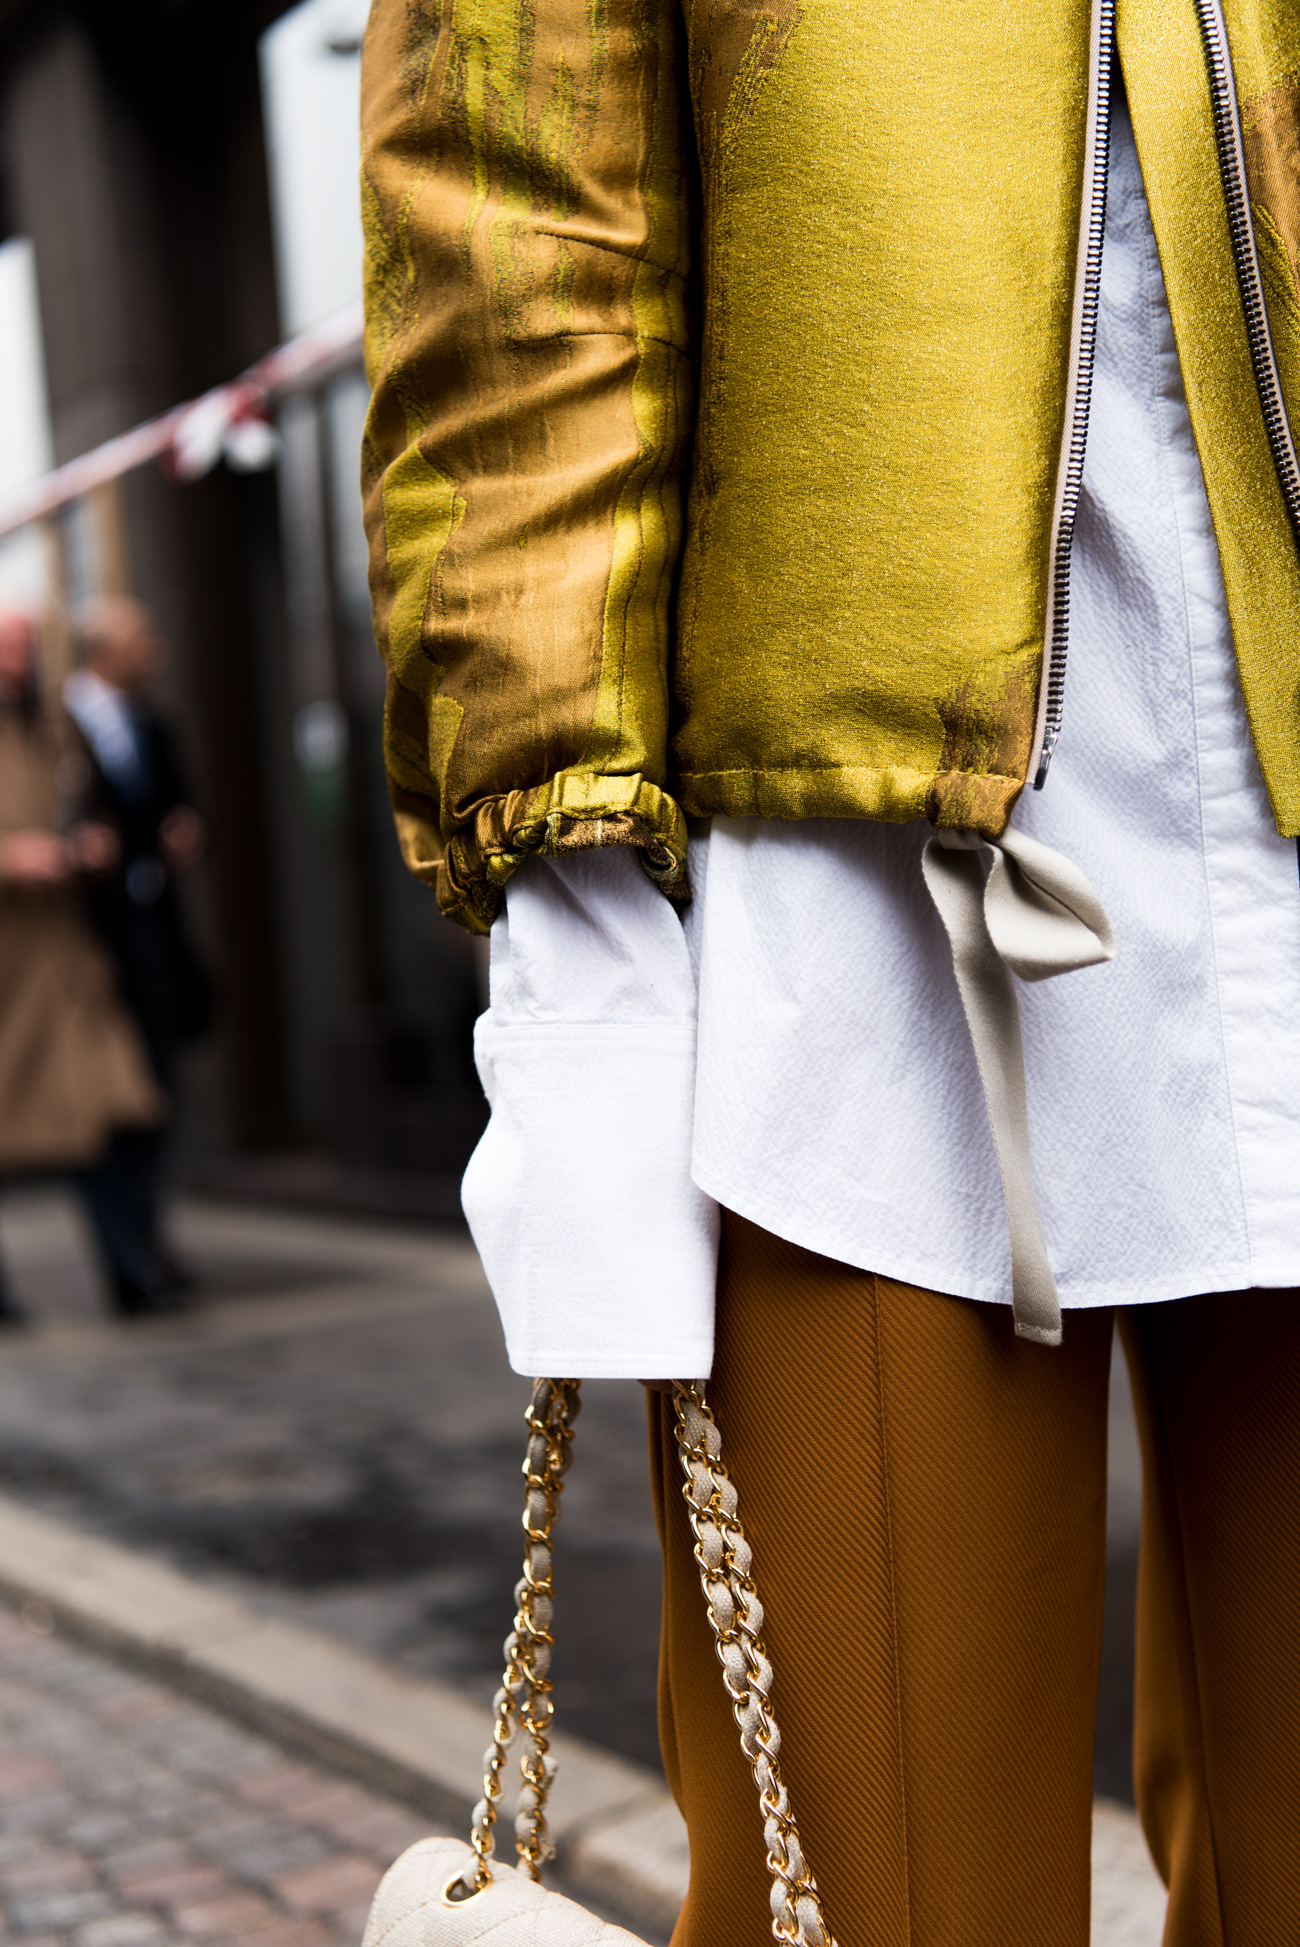 milan-fashion-week-streetstyle-layering-bomber-jacke-dorothee-schumacher-nina-schwichtenberg-fashiioncarpet